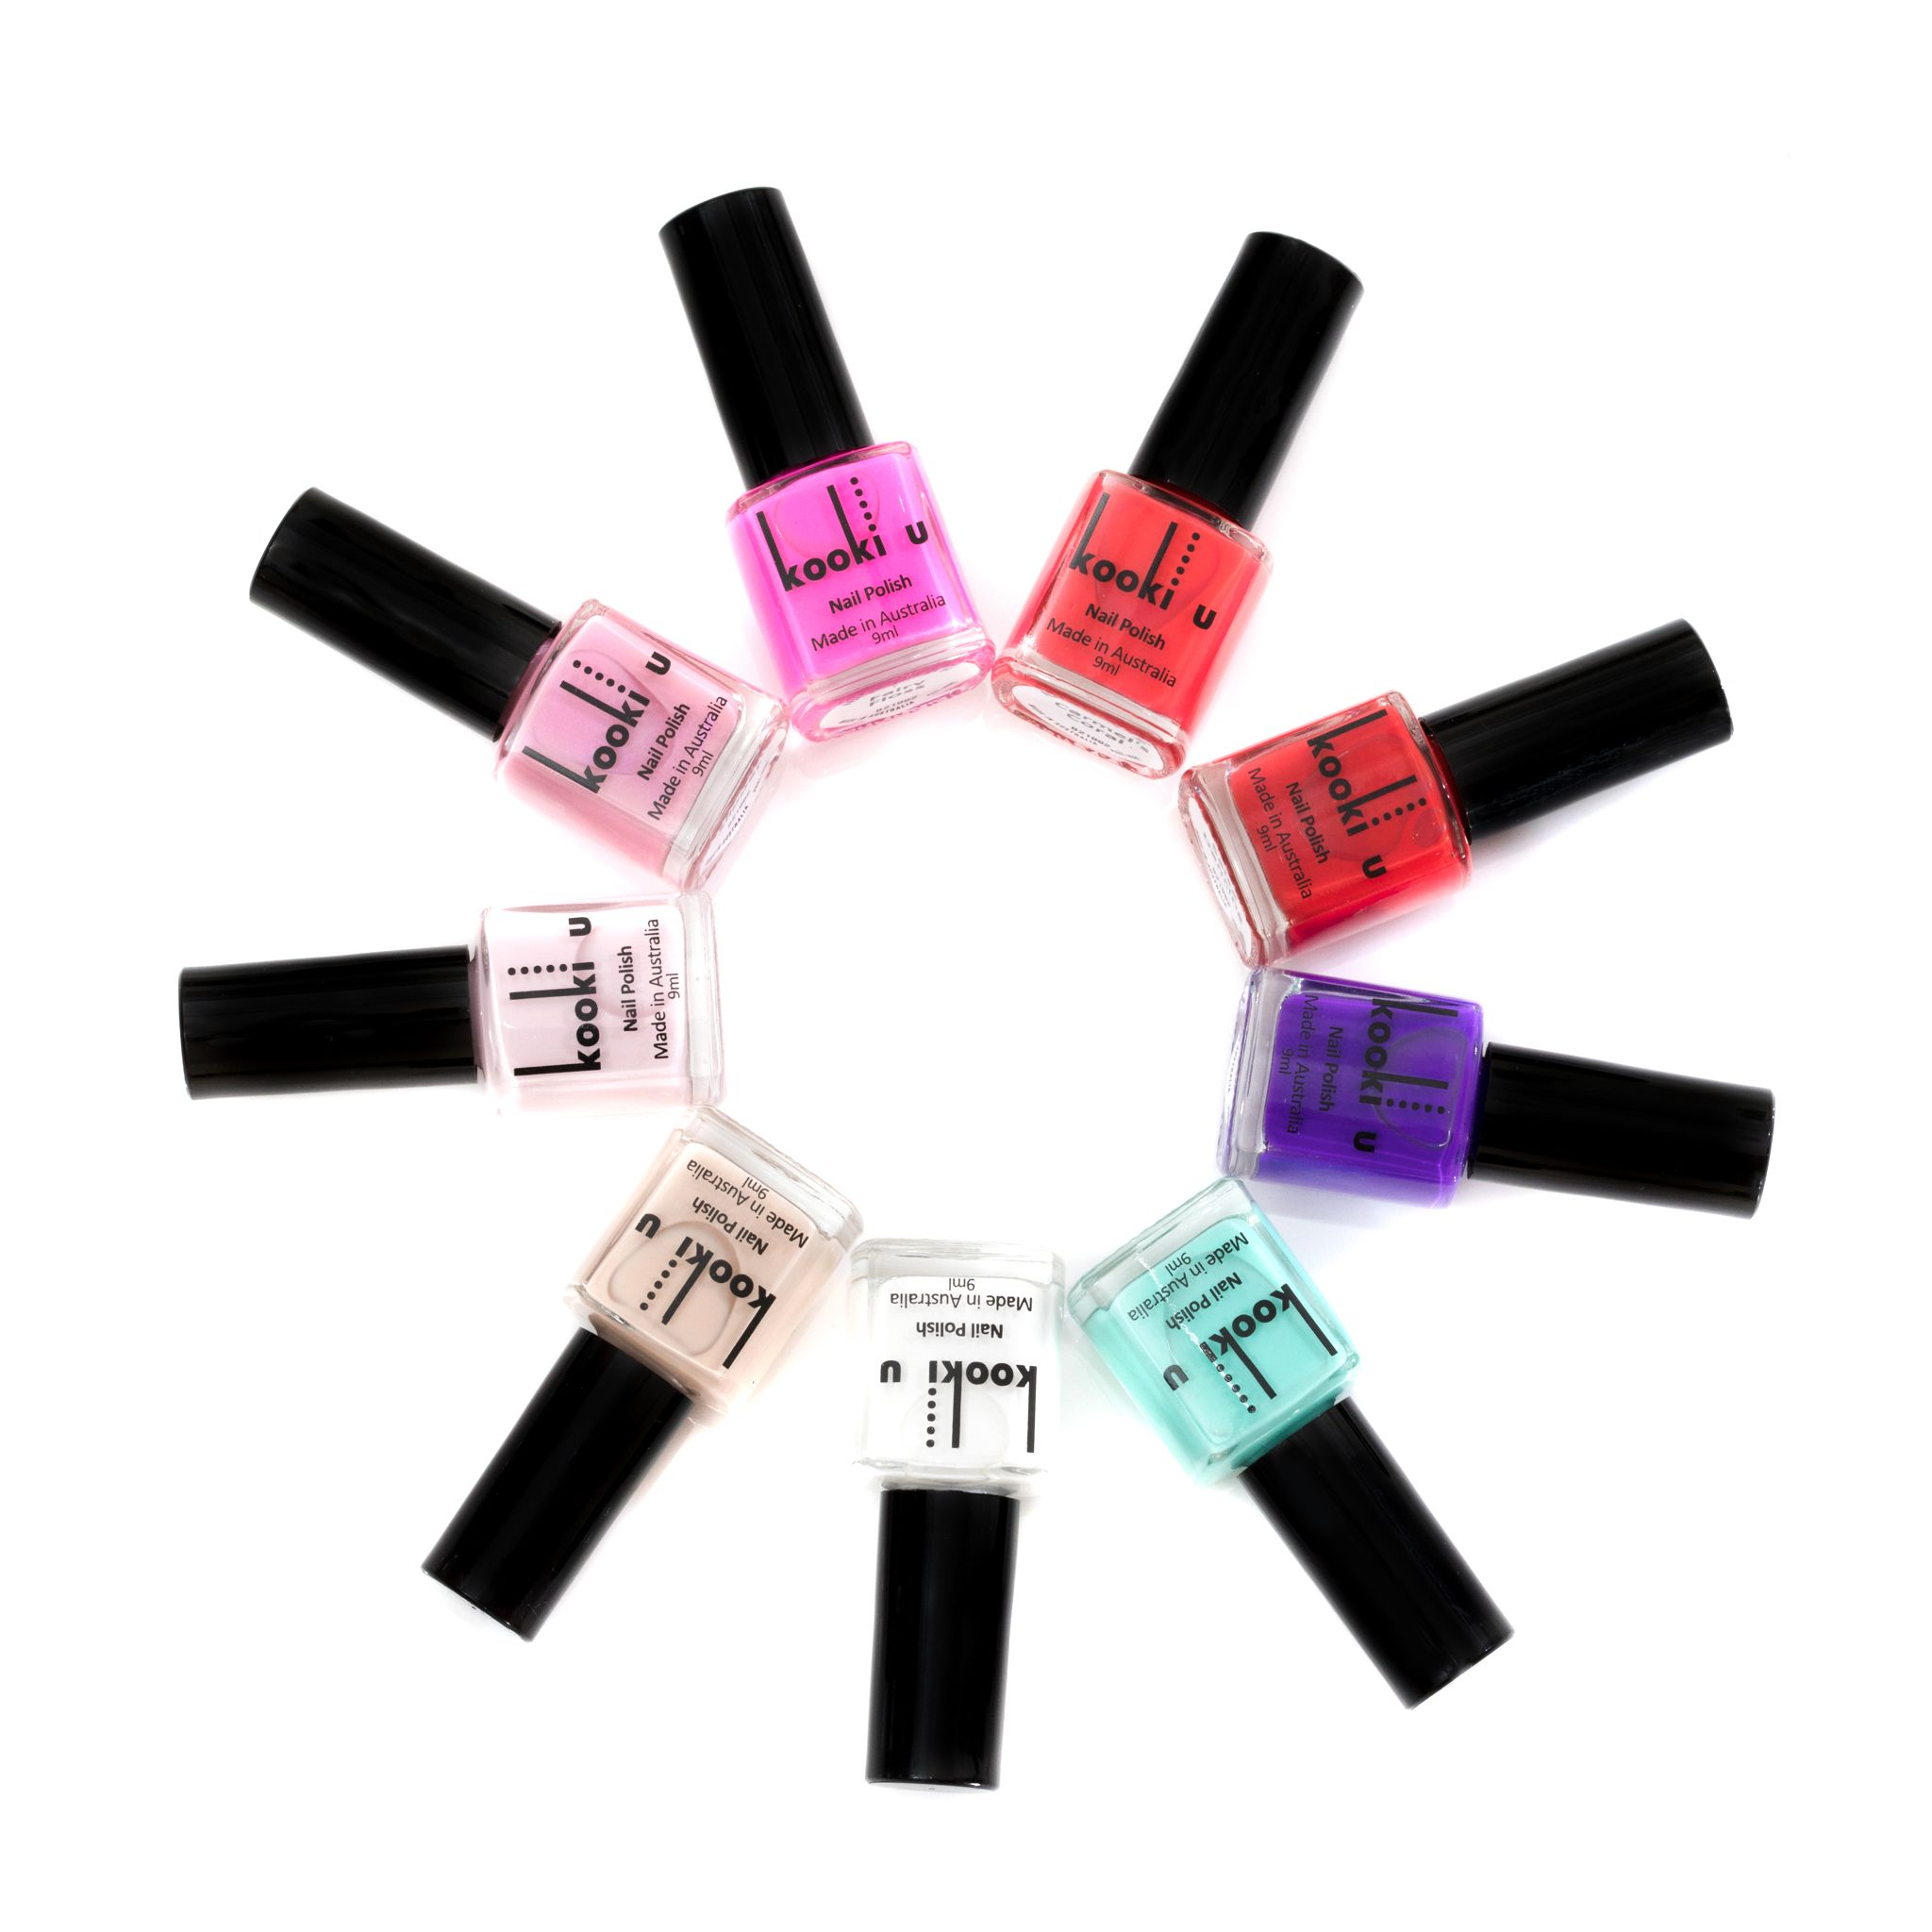 Our everyday range! kookiu kookiuaustralia cosmetics